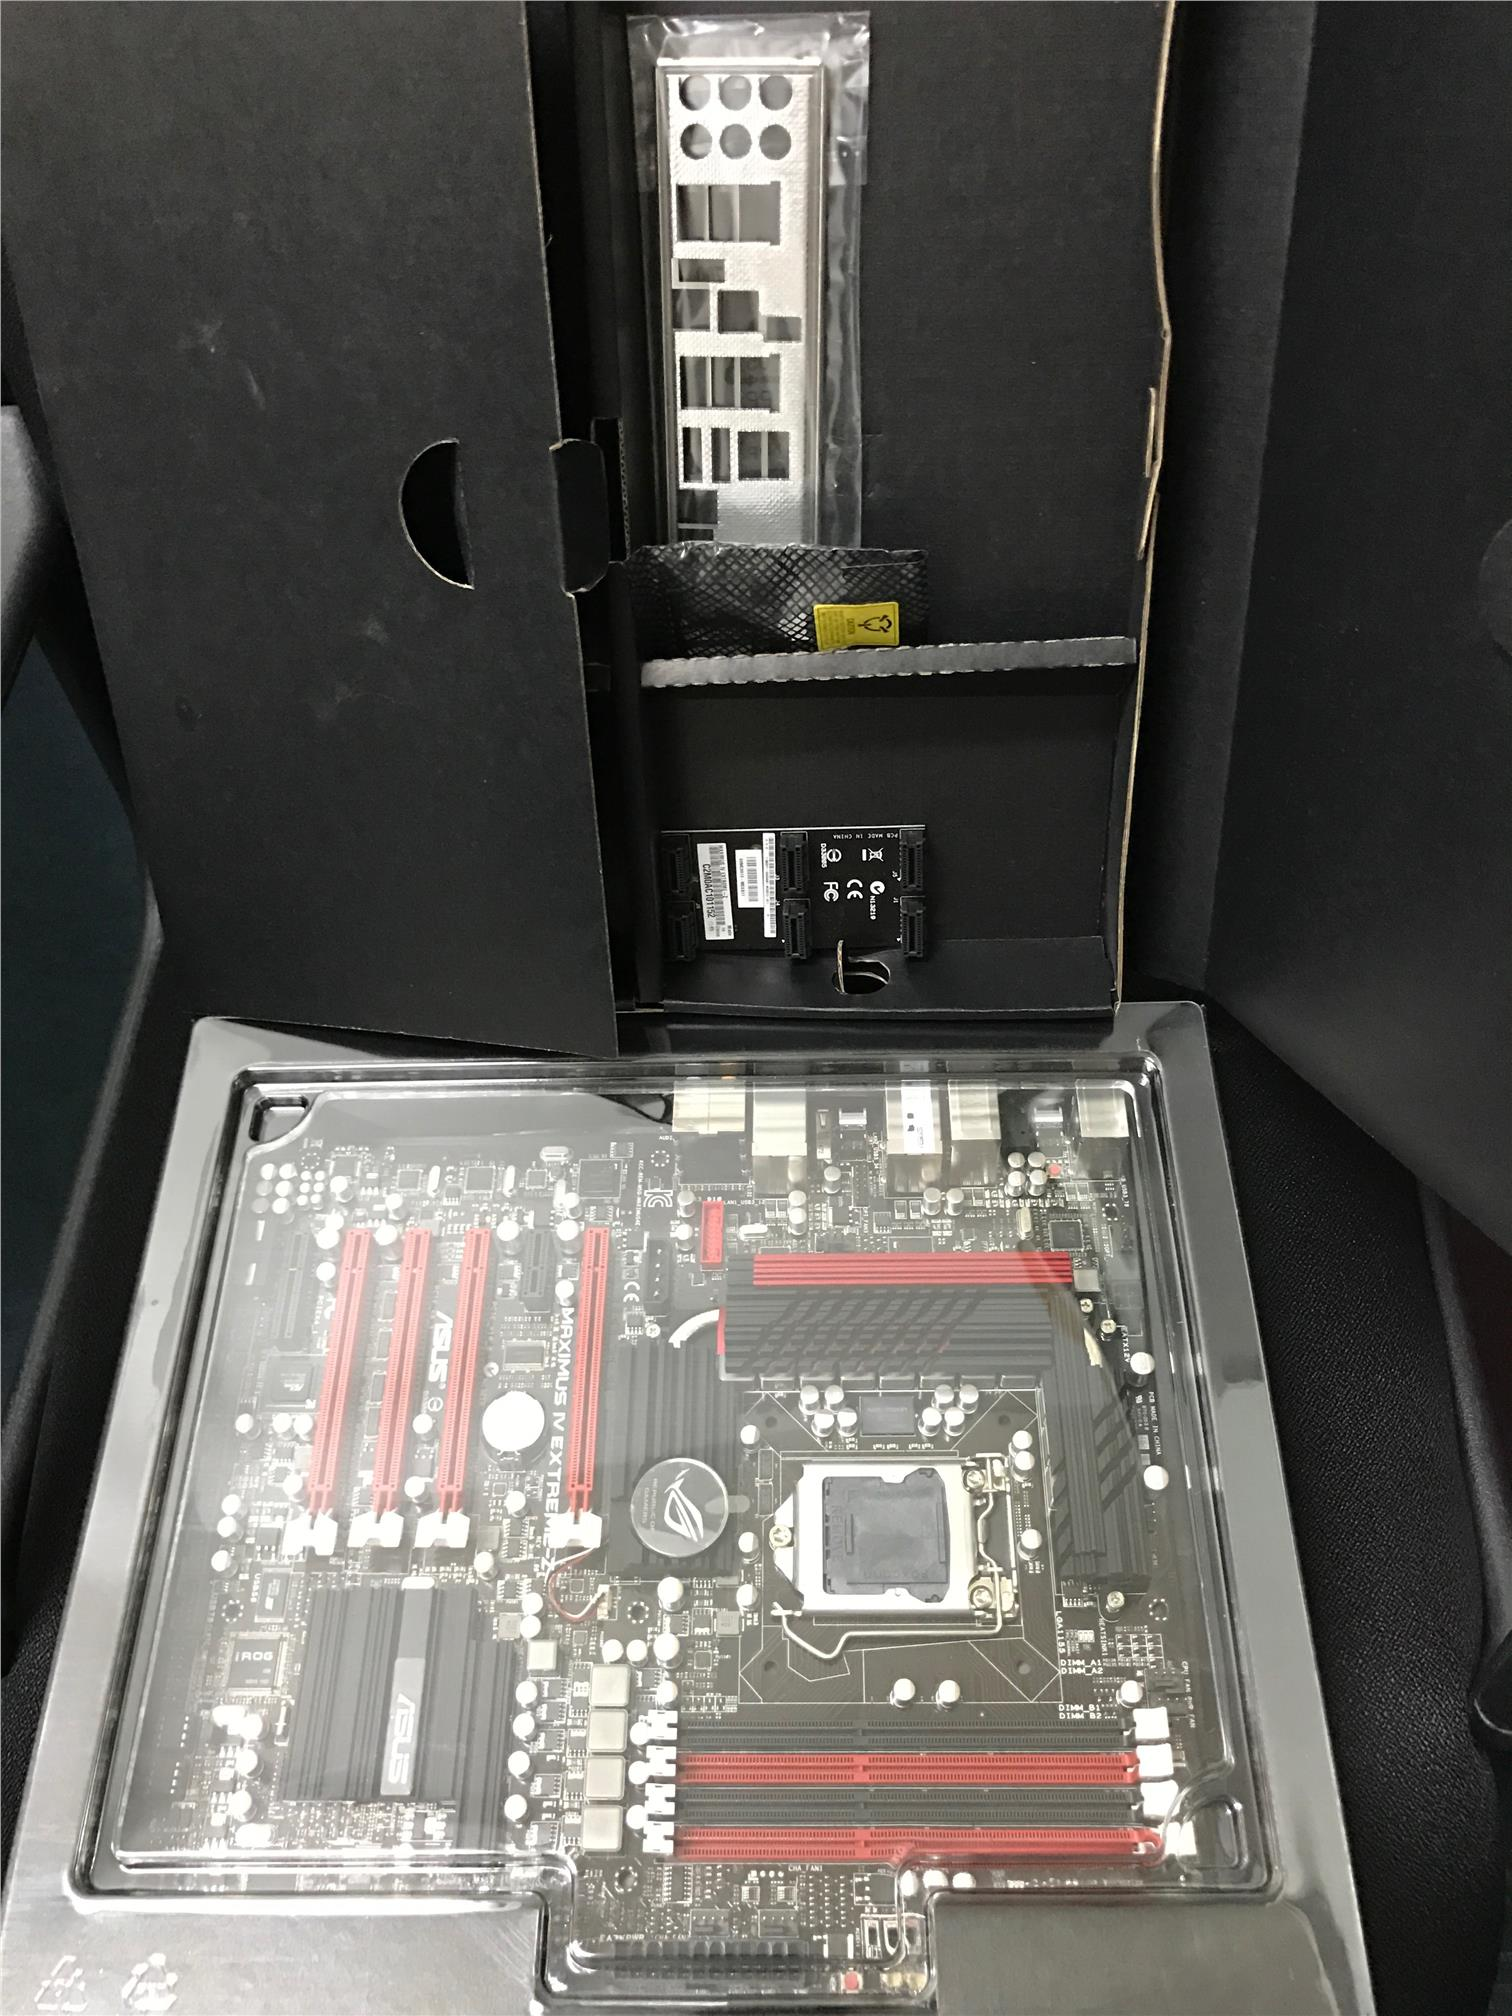 ASUS MAXIMUS VI EXTREME Z68 Socket LGA 1155 Intel Z68 Motherboard